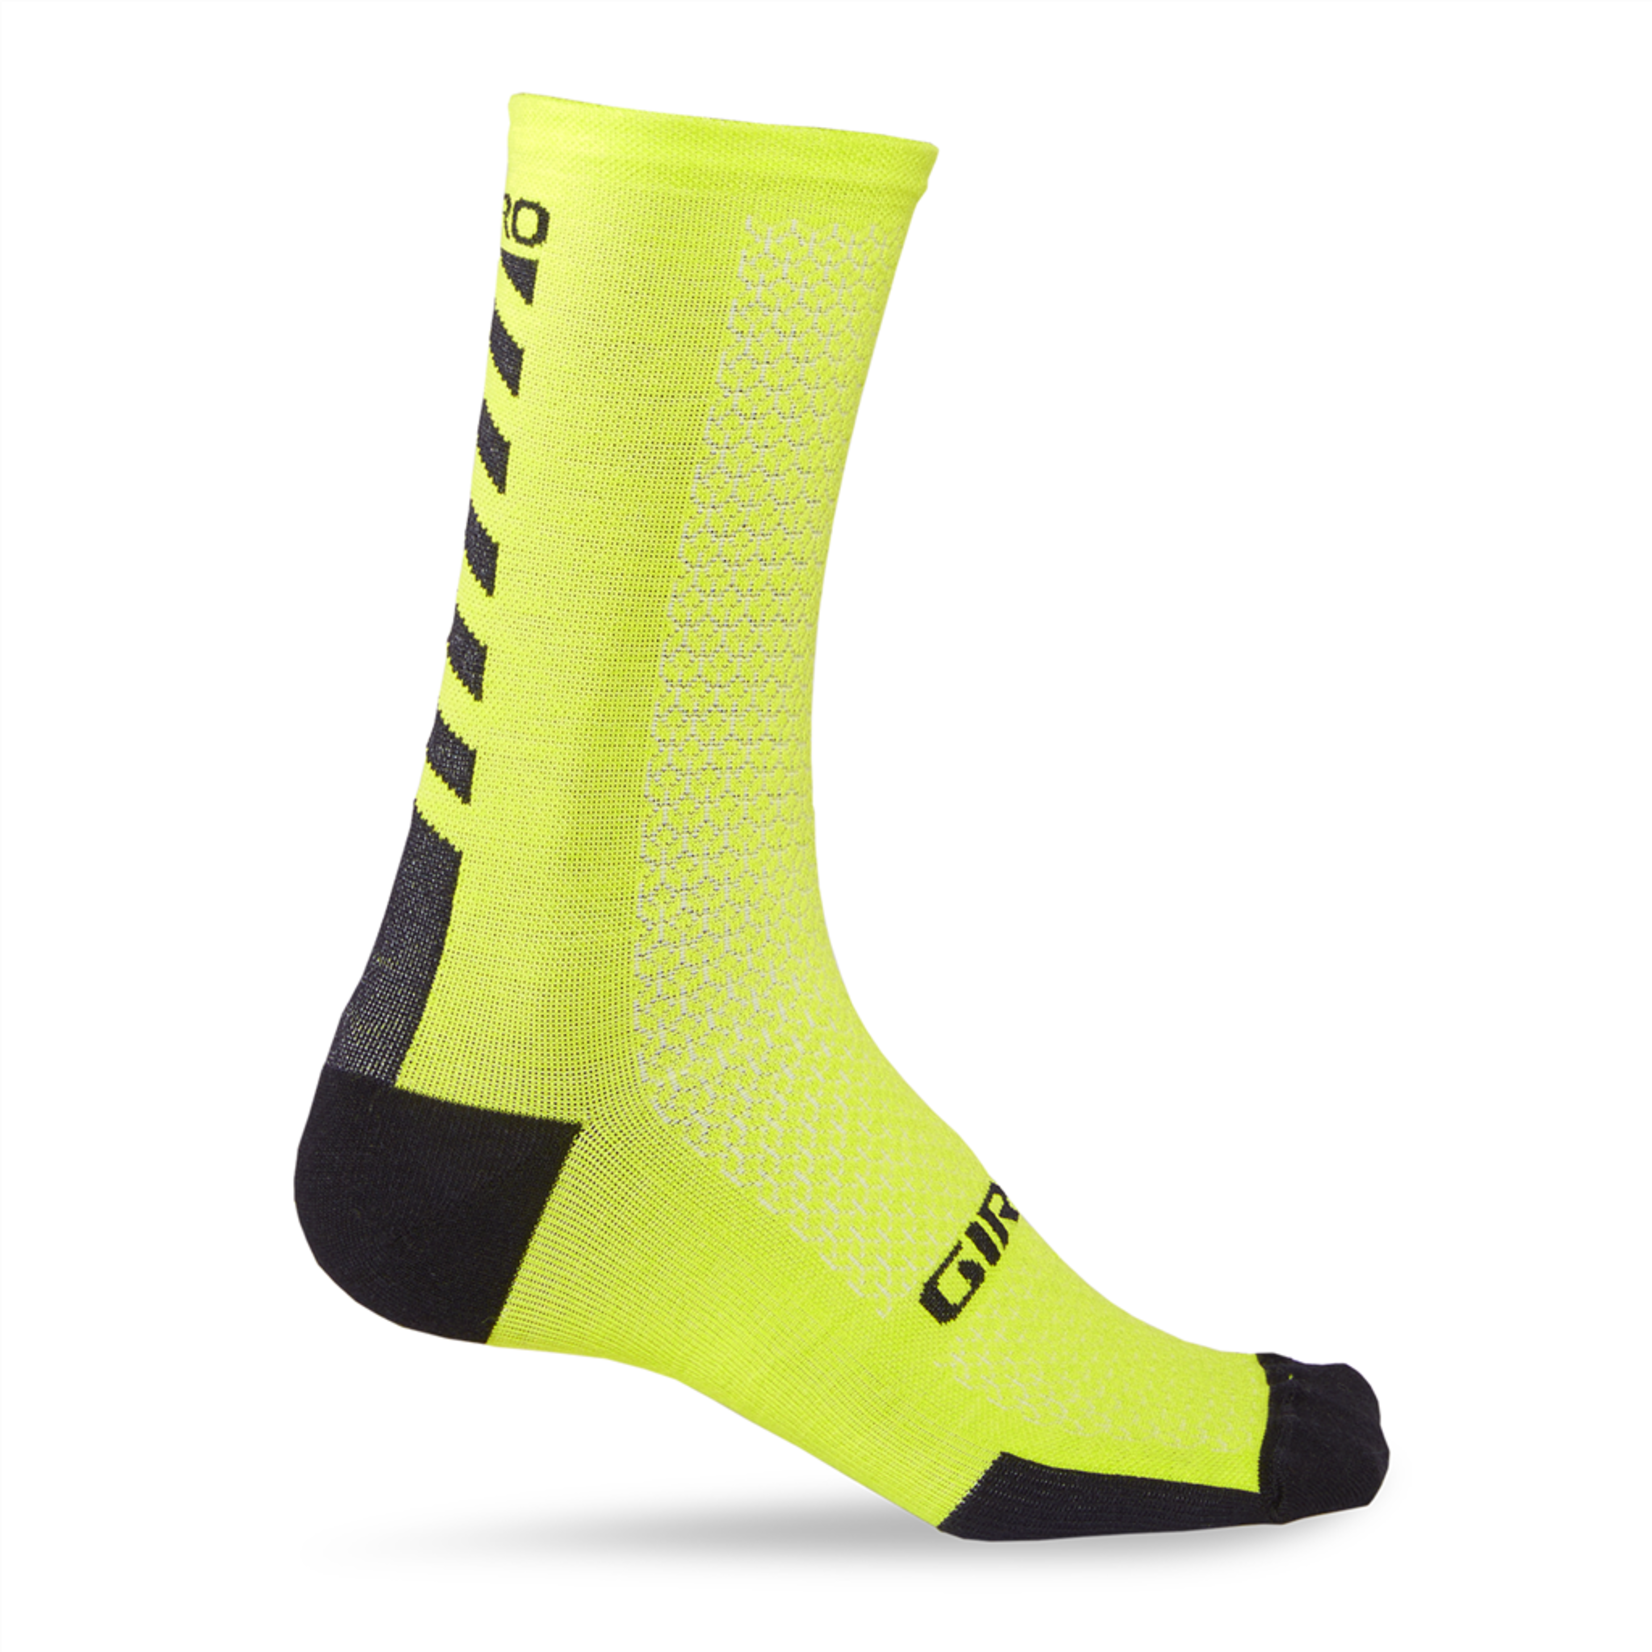 Giro Giro - Socke HRc + merino giallo L